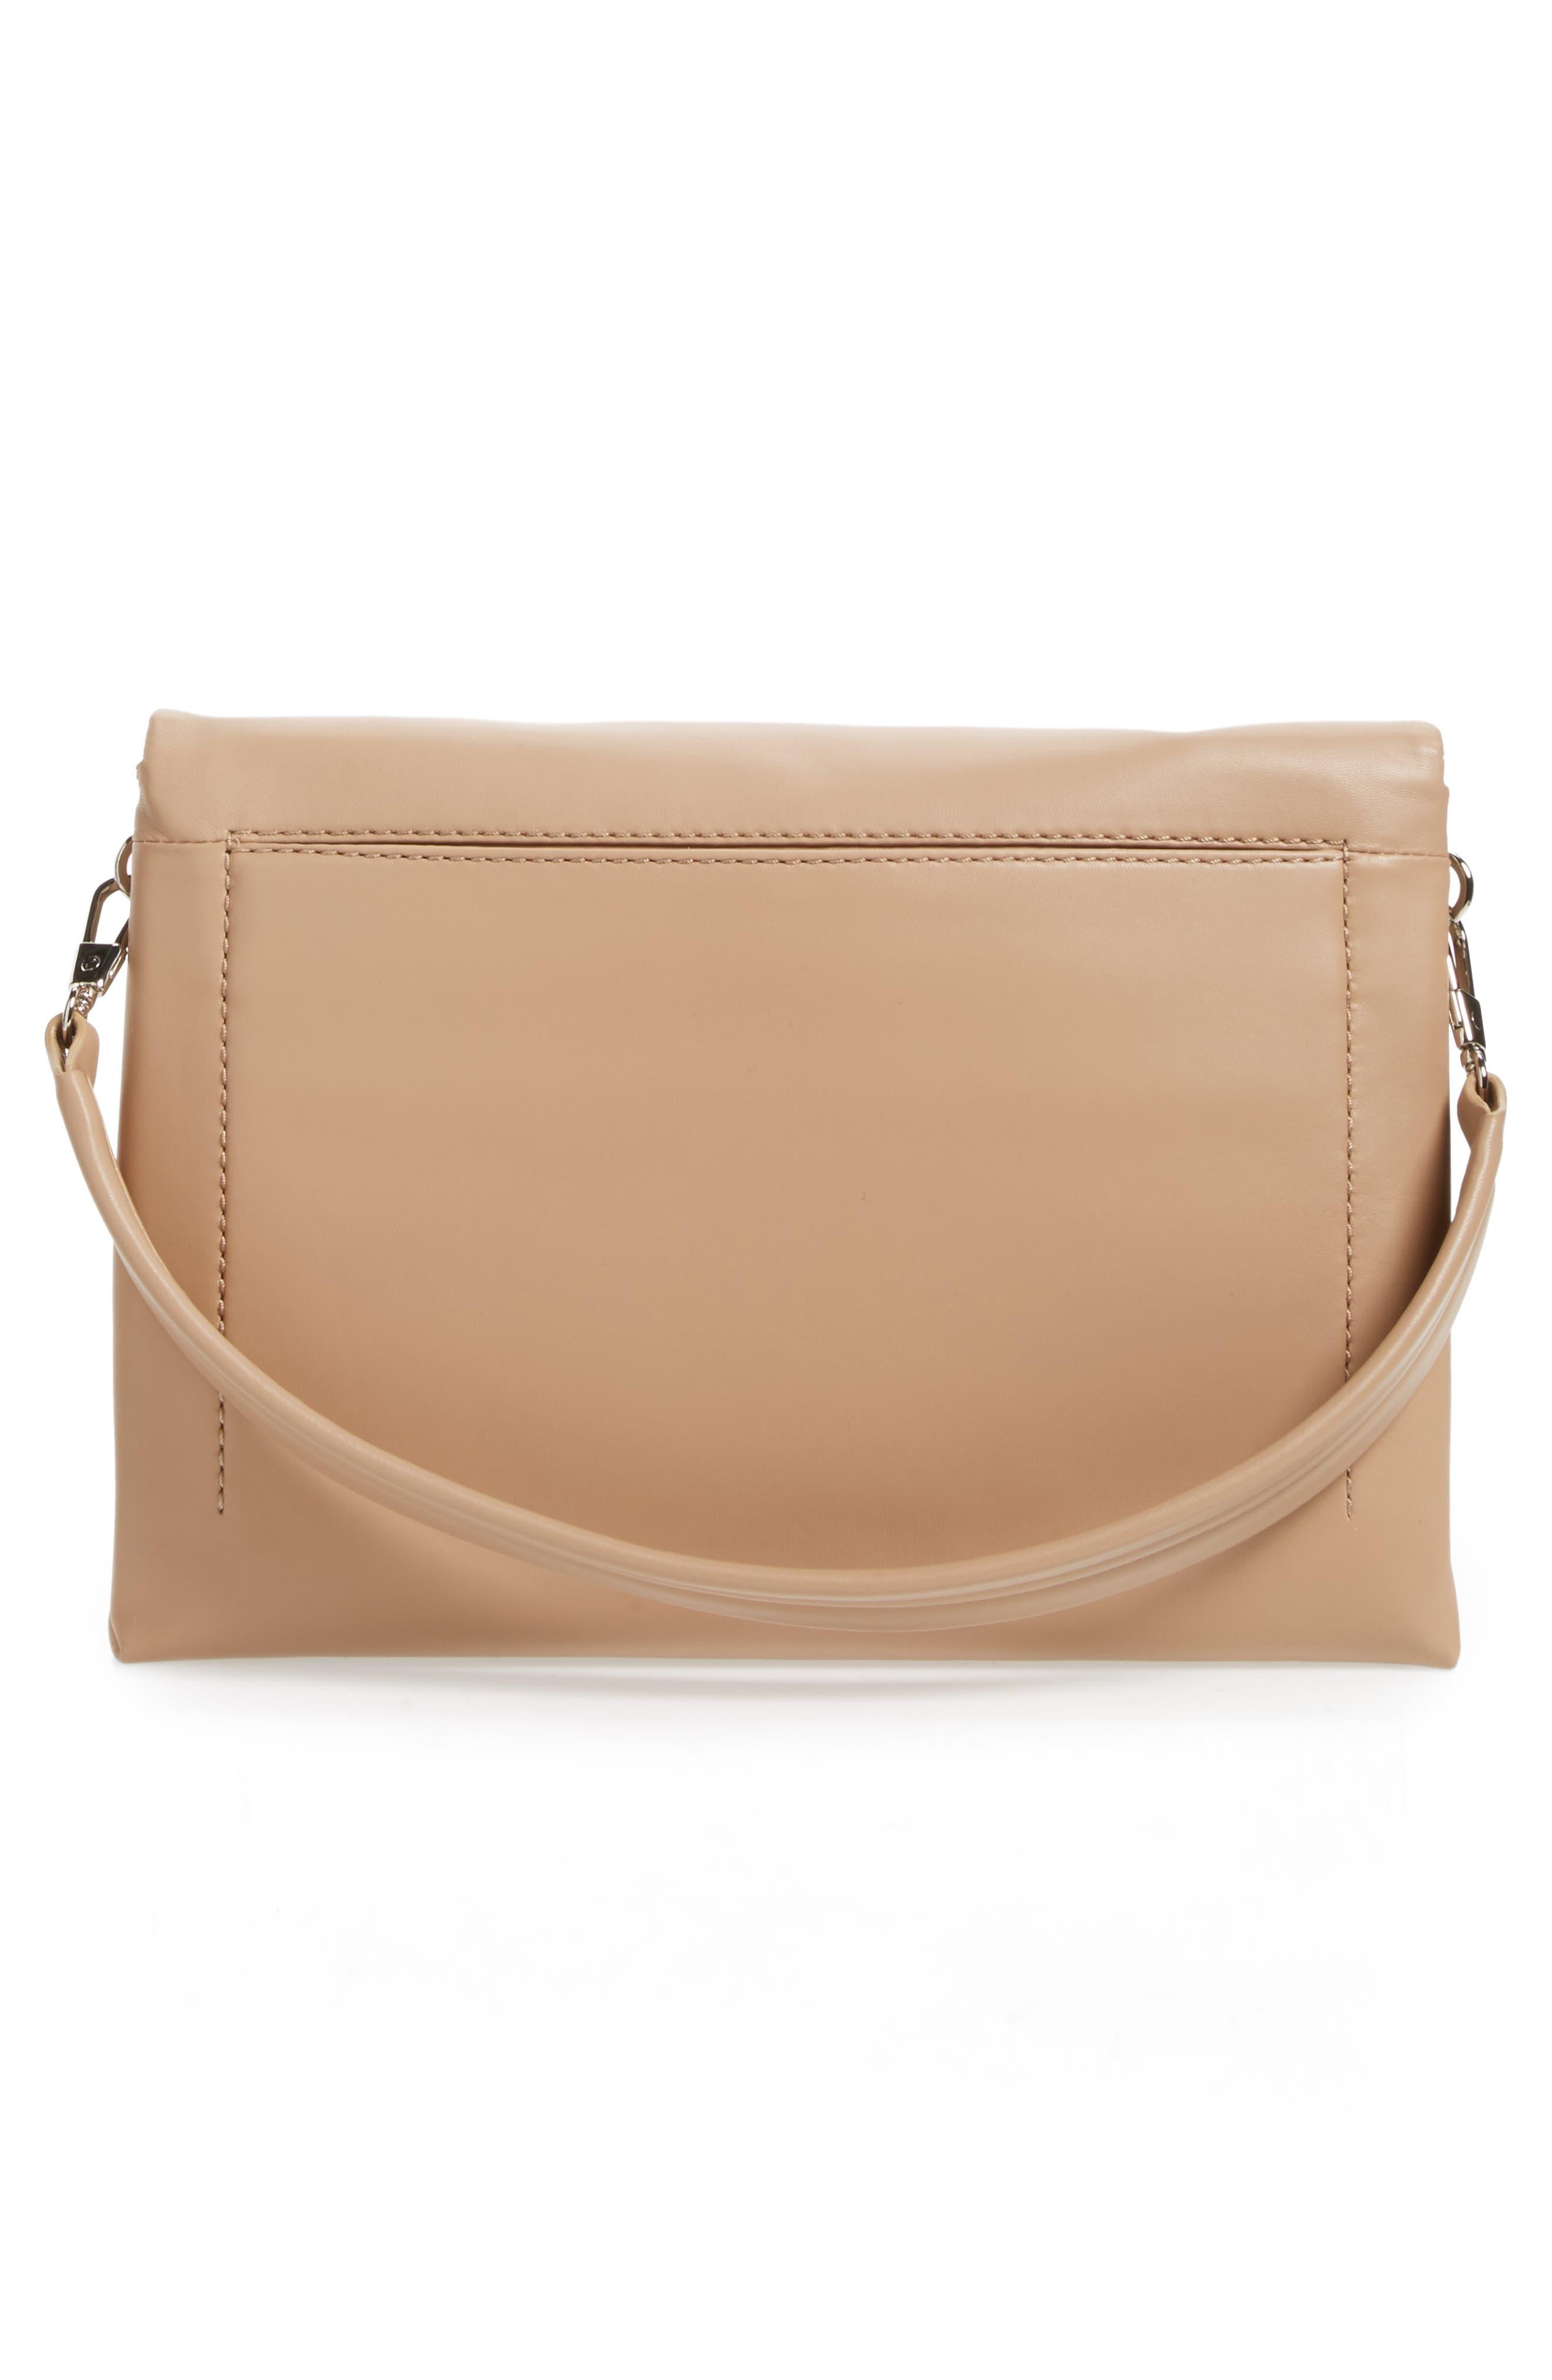 Oversized Alix Flap Leather Shoulder Bag,                             Alternate thumbnail 4, color,                             260